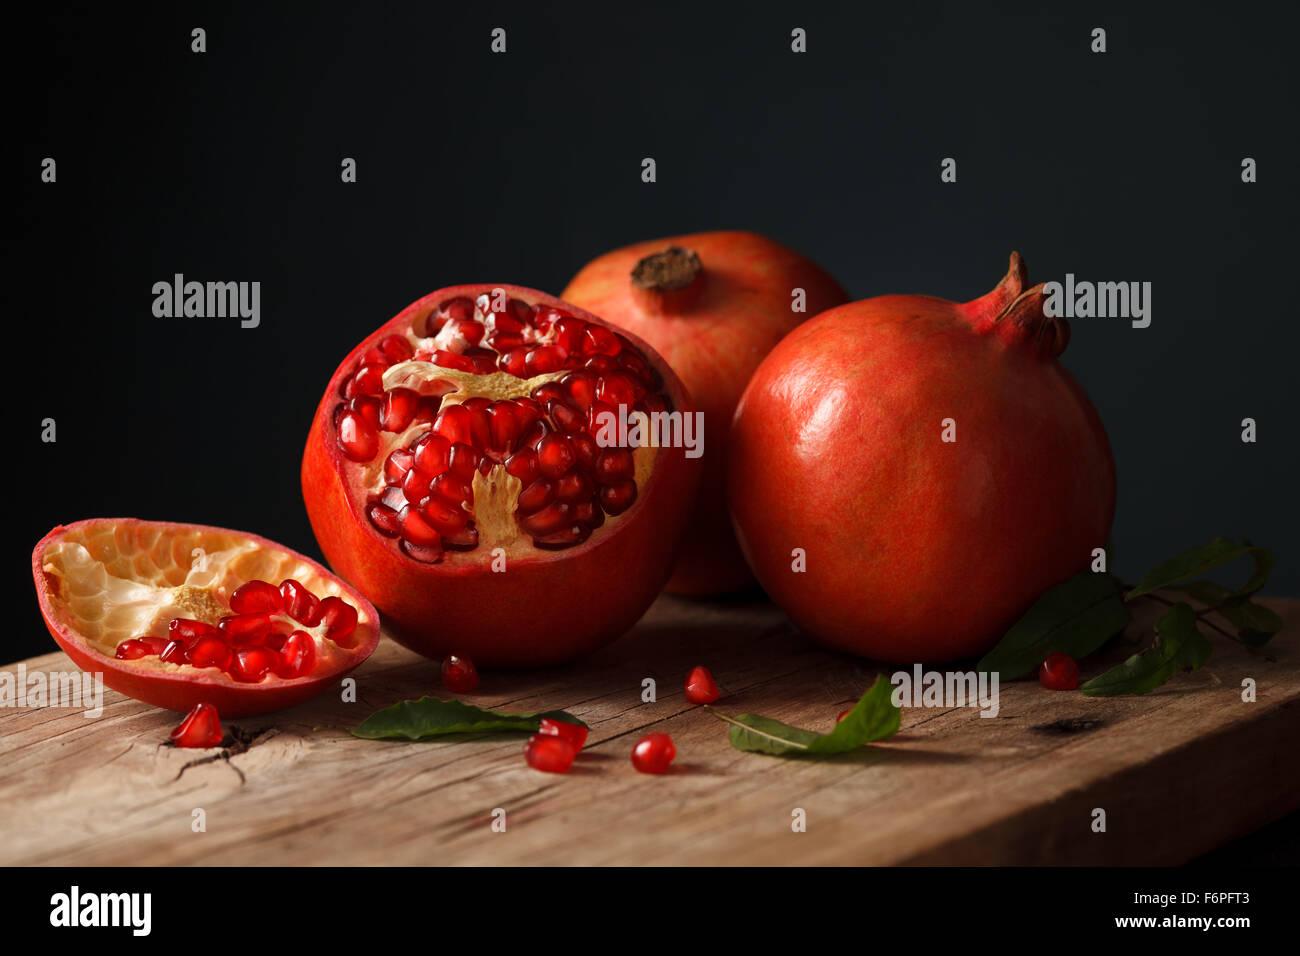 pomegranate fruit healthy food fresh organic still life vegetarian juicy antioxidant - Stock Image